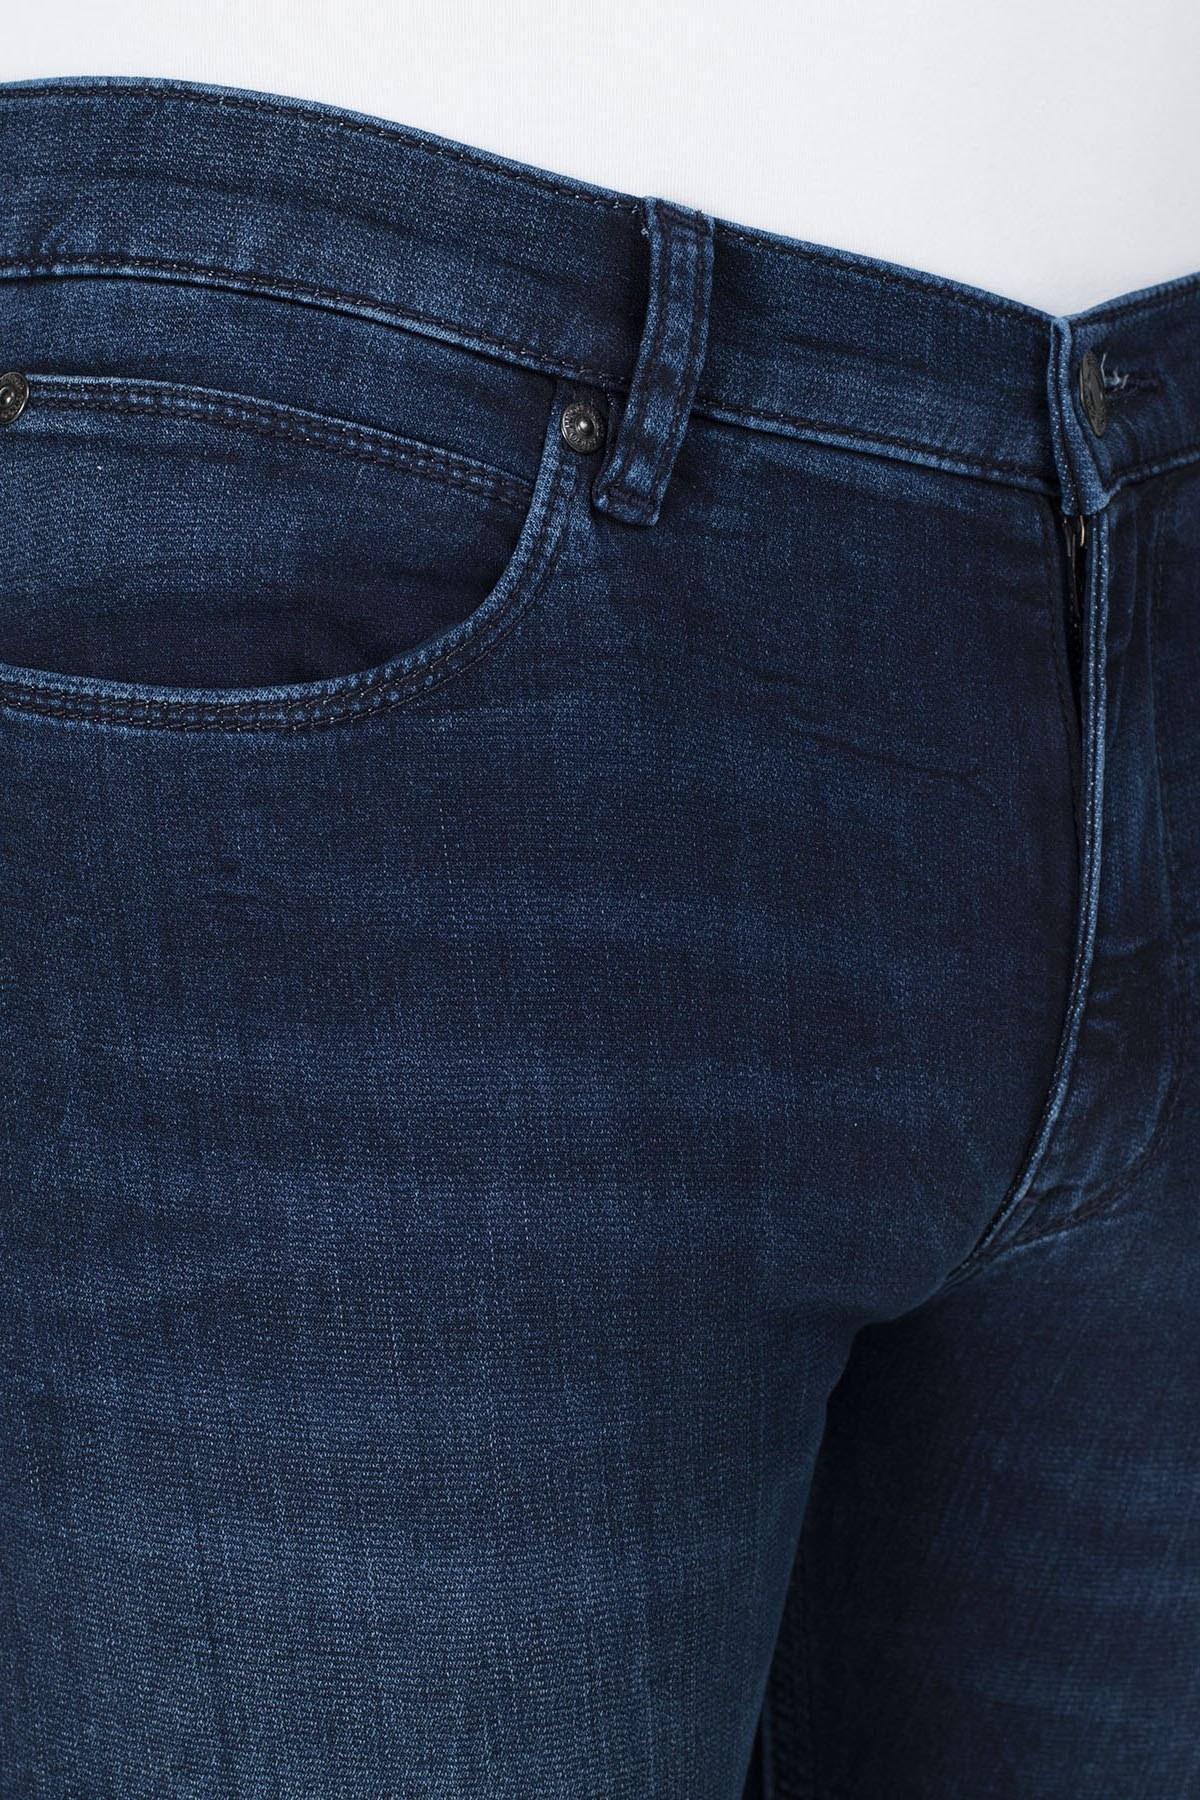 Hugo Boss Skinny Fit Jeans Erkek Kot Pantolon 50426677 408 LACİVERT